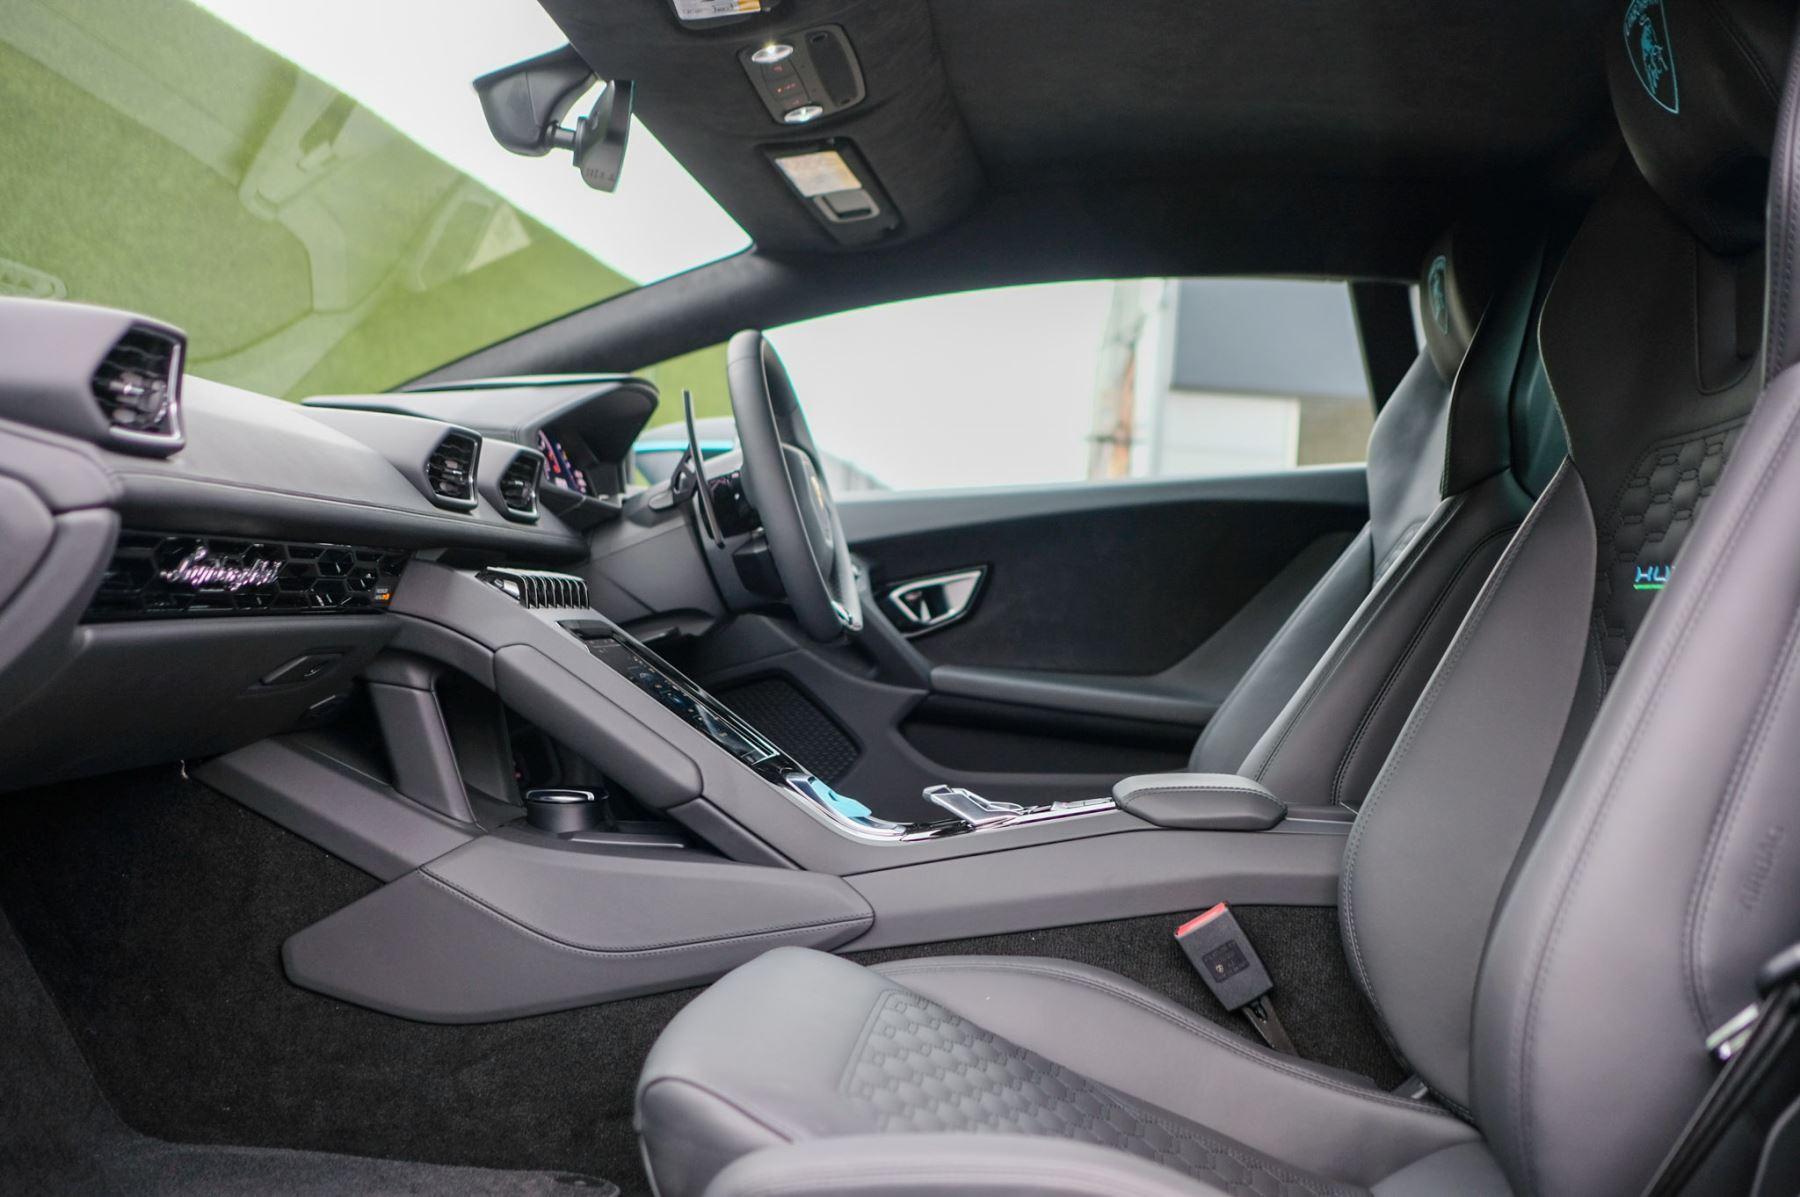 Lamborghini Huracan EVO Coupe image 6